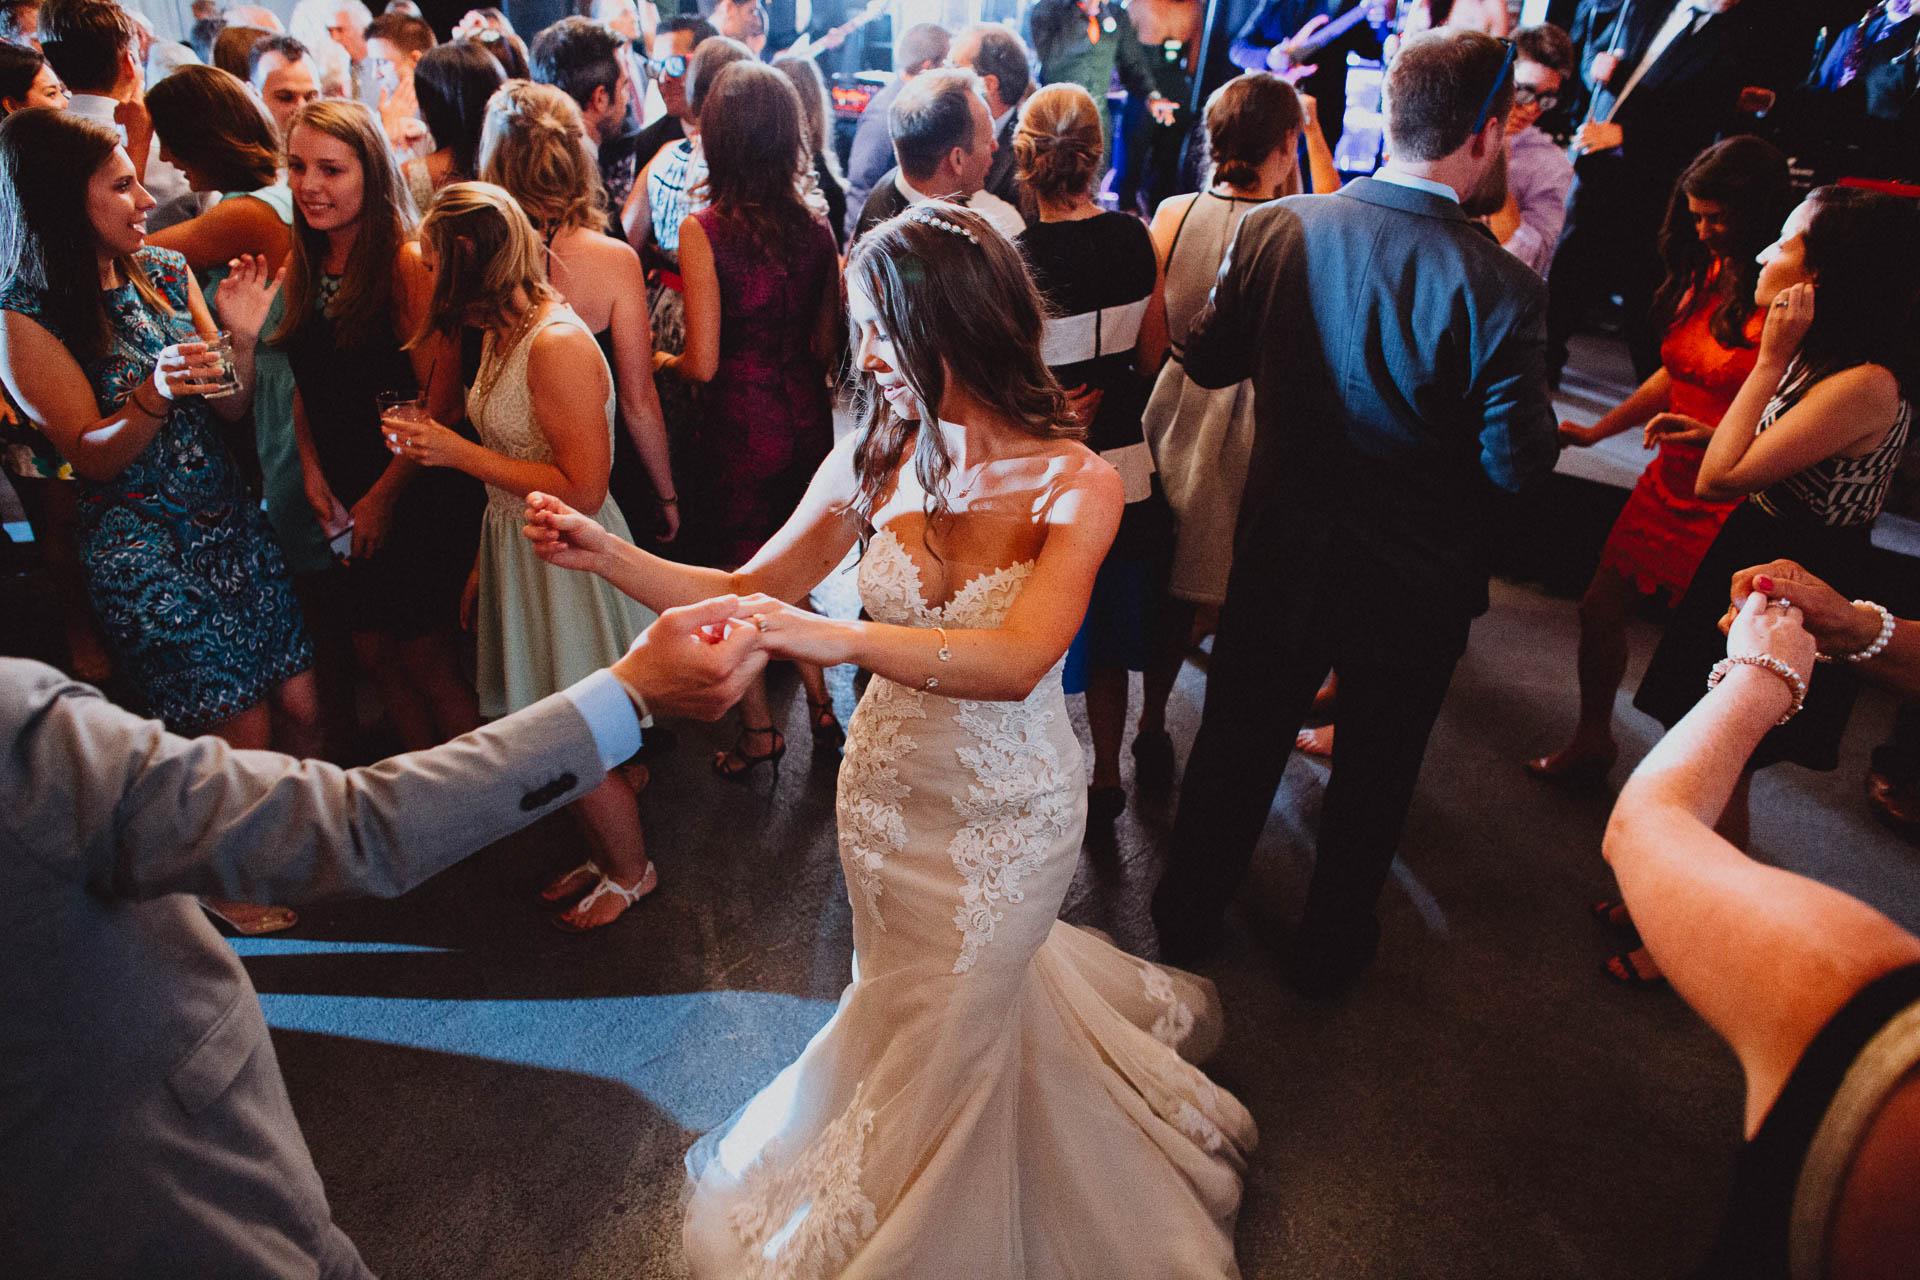 Keri-Joseph-Top-of-the-Market-Wedding-199@2x.jpg